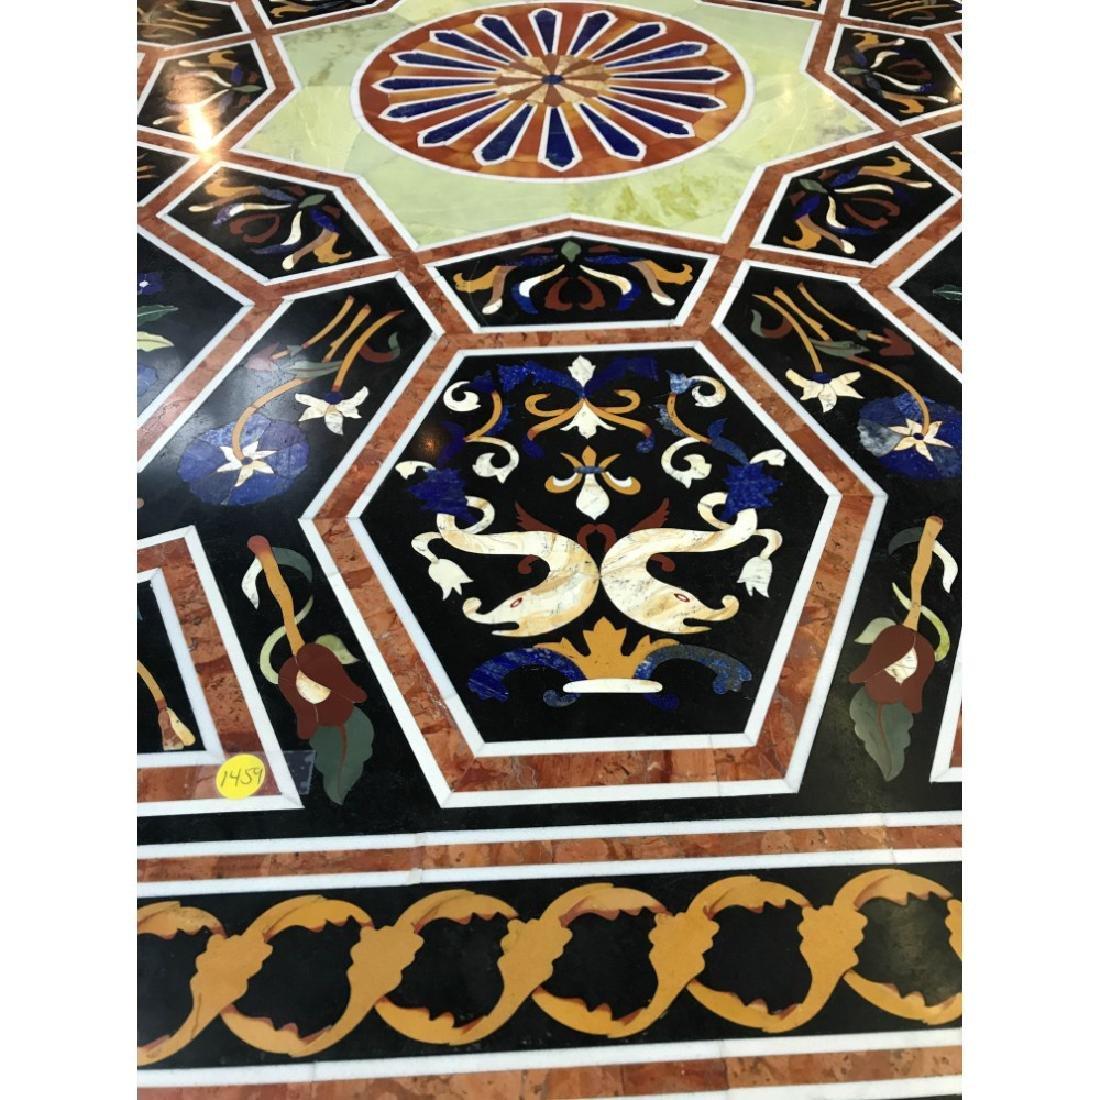 Mosaic Pietra Dura Octagon-Shaped Table - 3